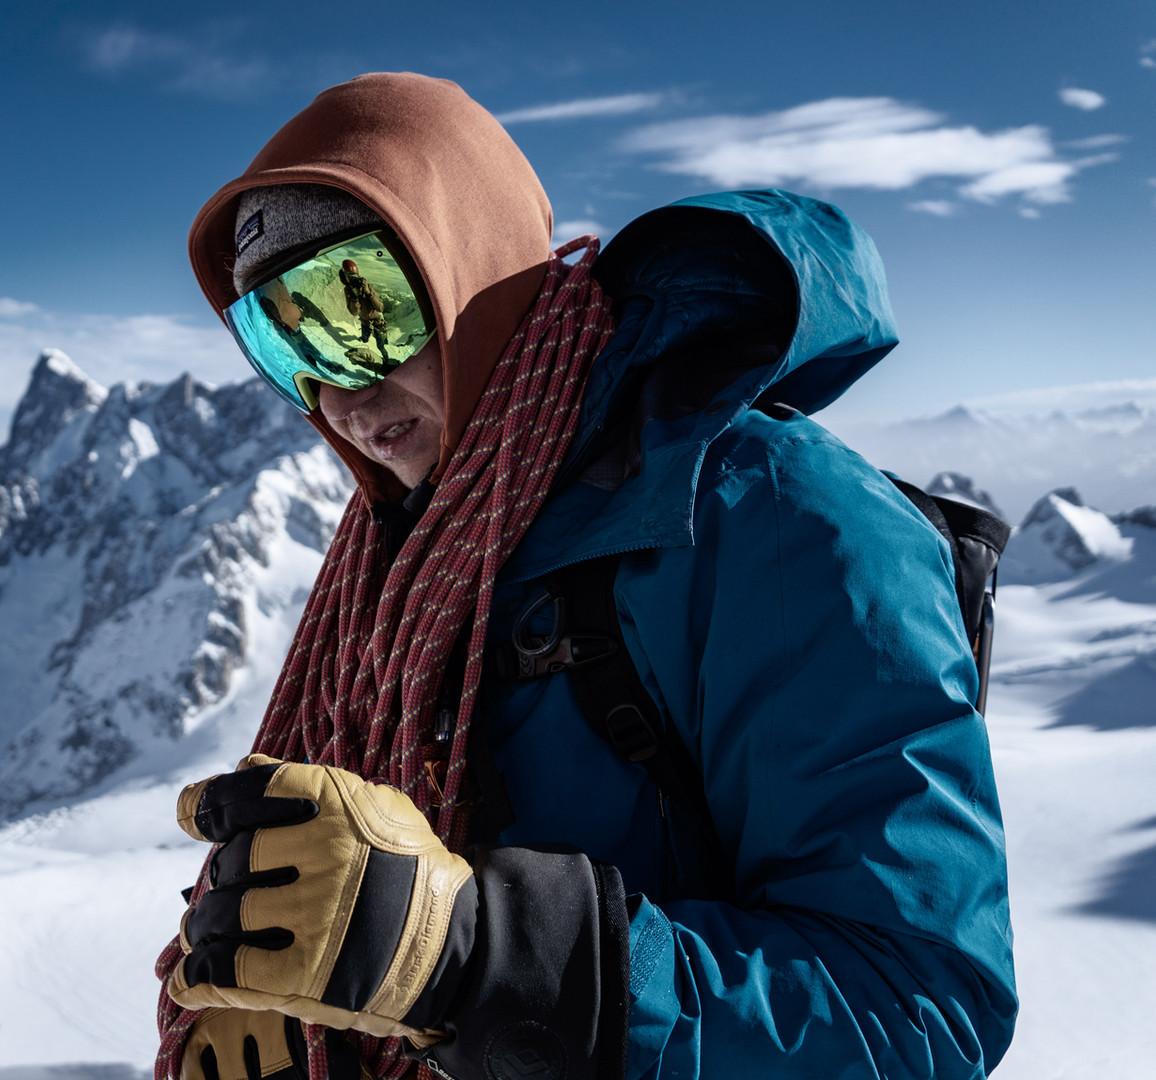 Freezing cold on the famous Cosmiques Ridge